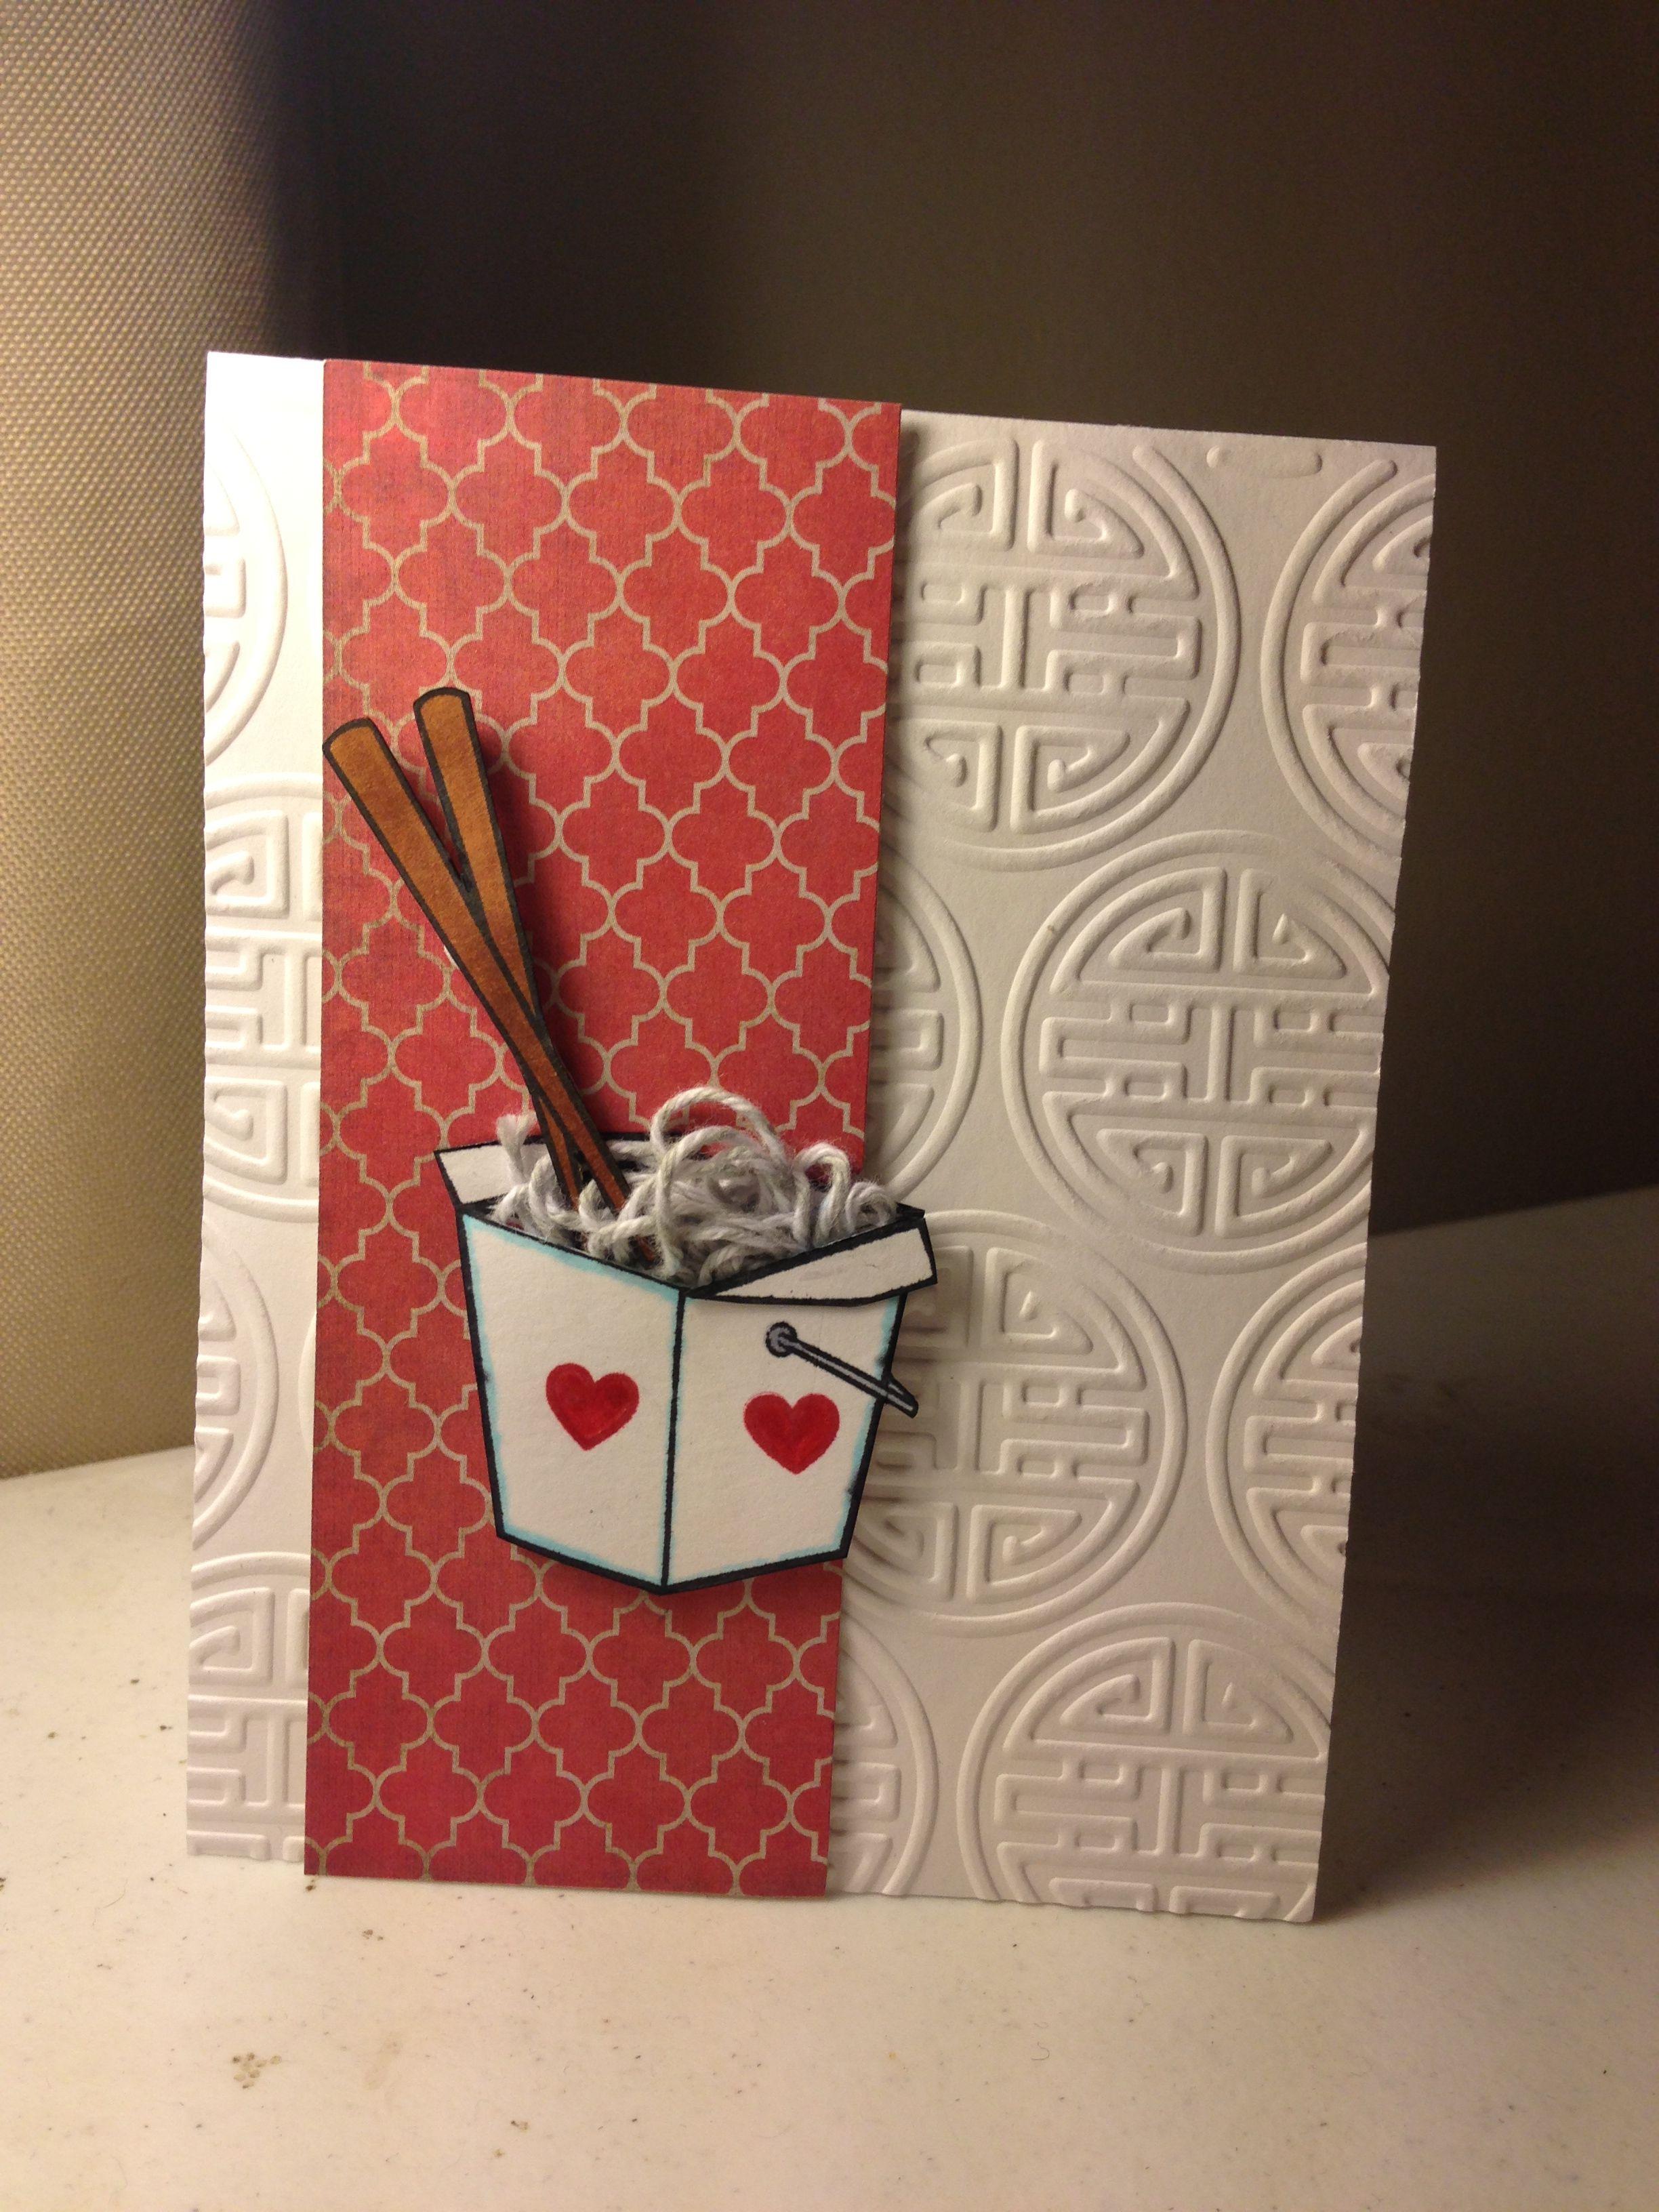 take out box chopsticks adhesive and box